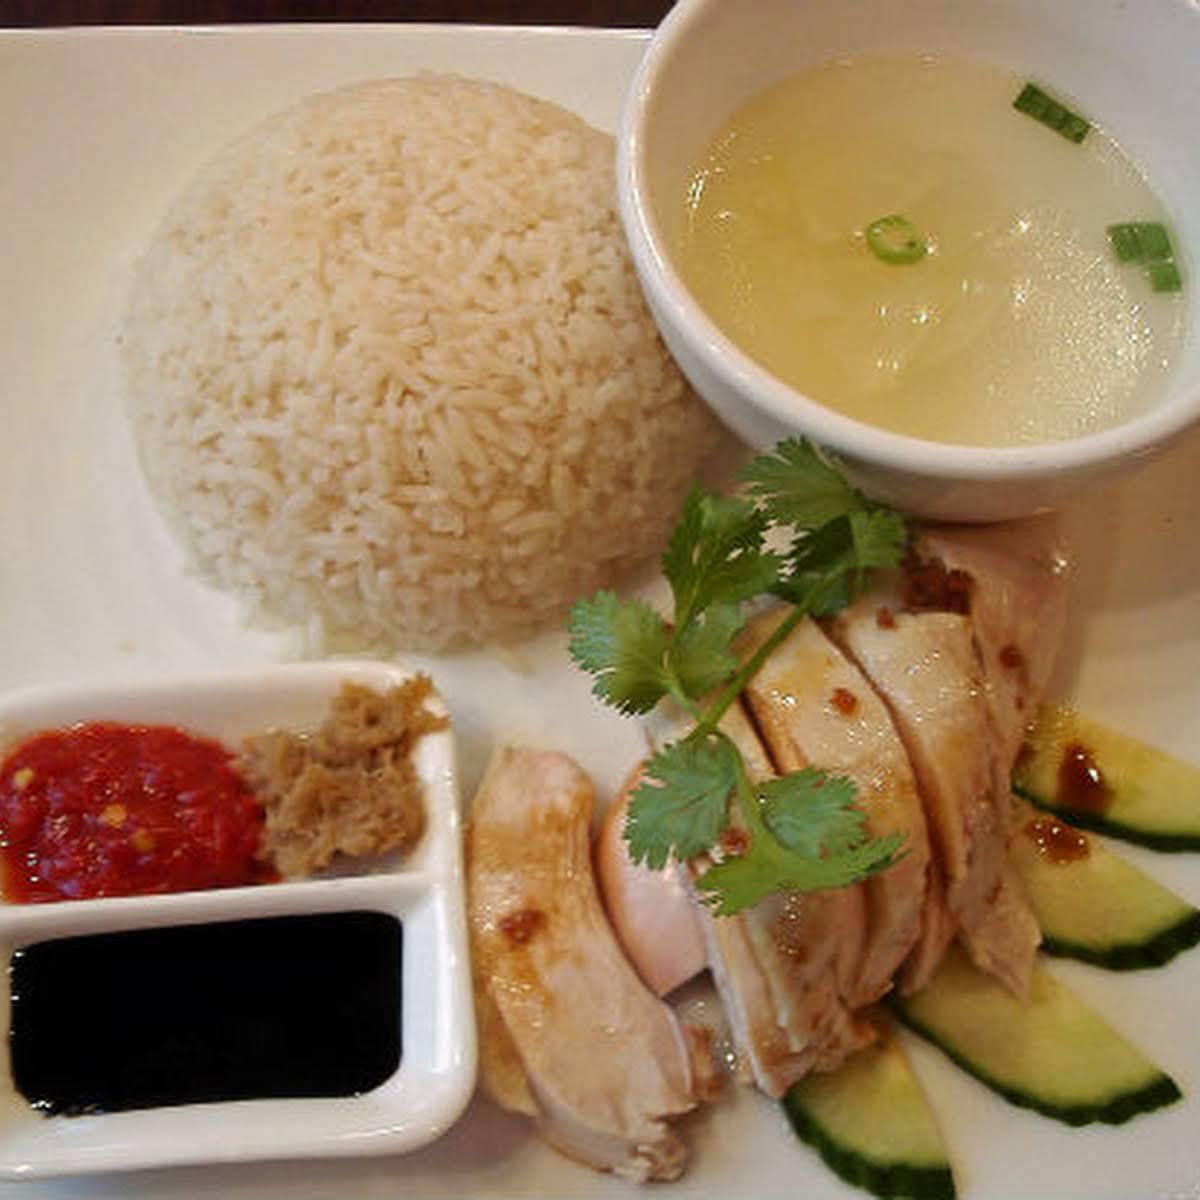 Hainanese Chicken Rice (Singapore Chicken Rice)